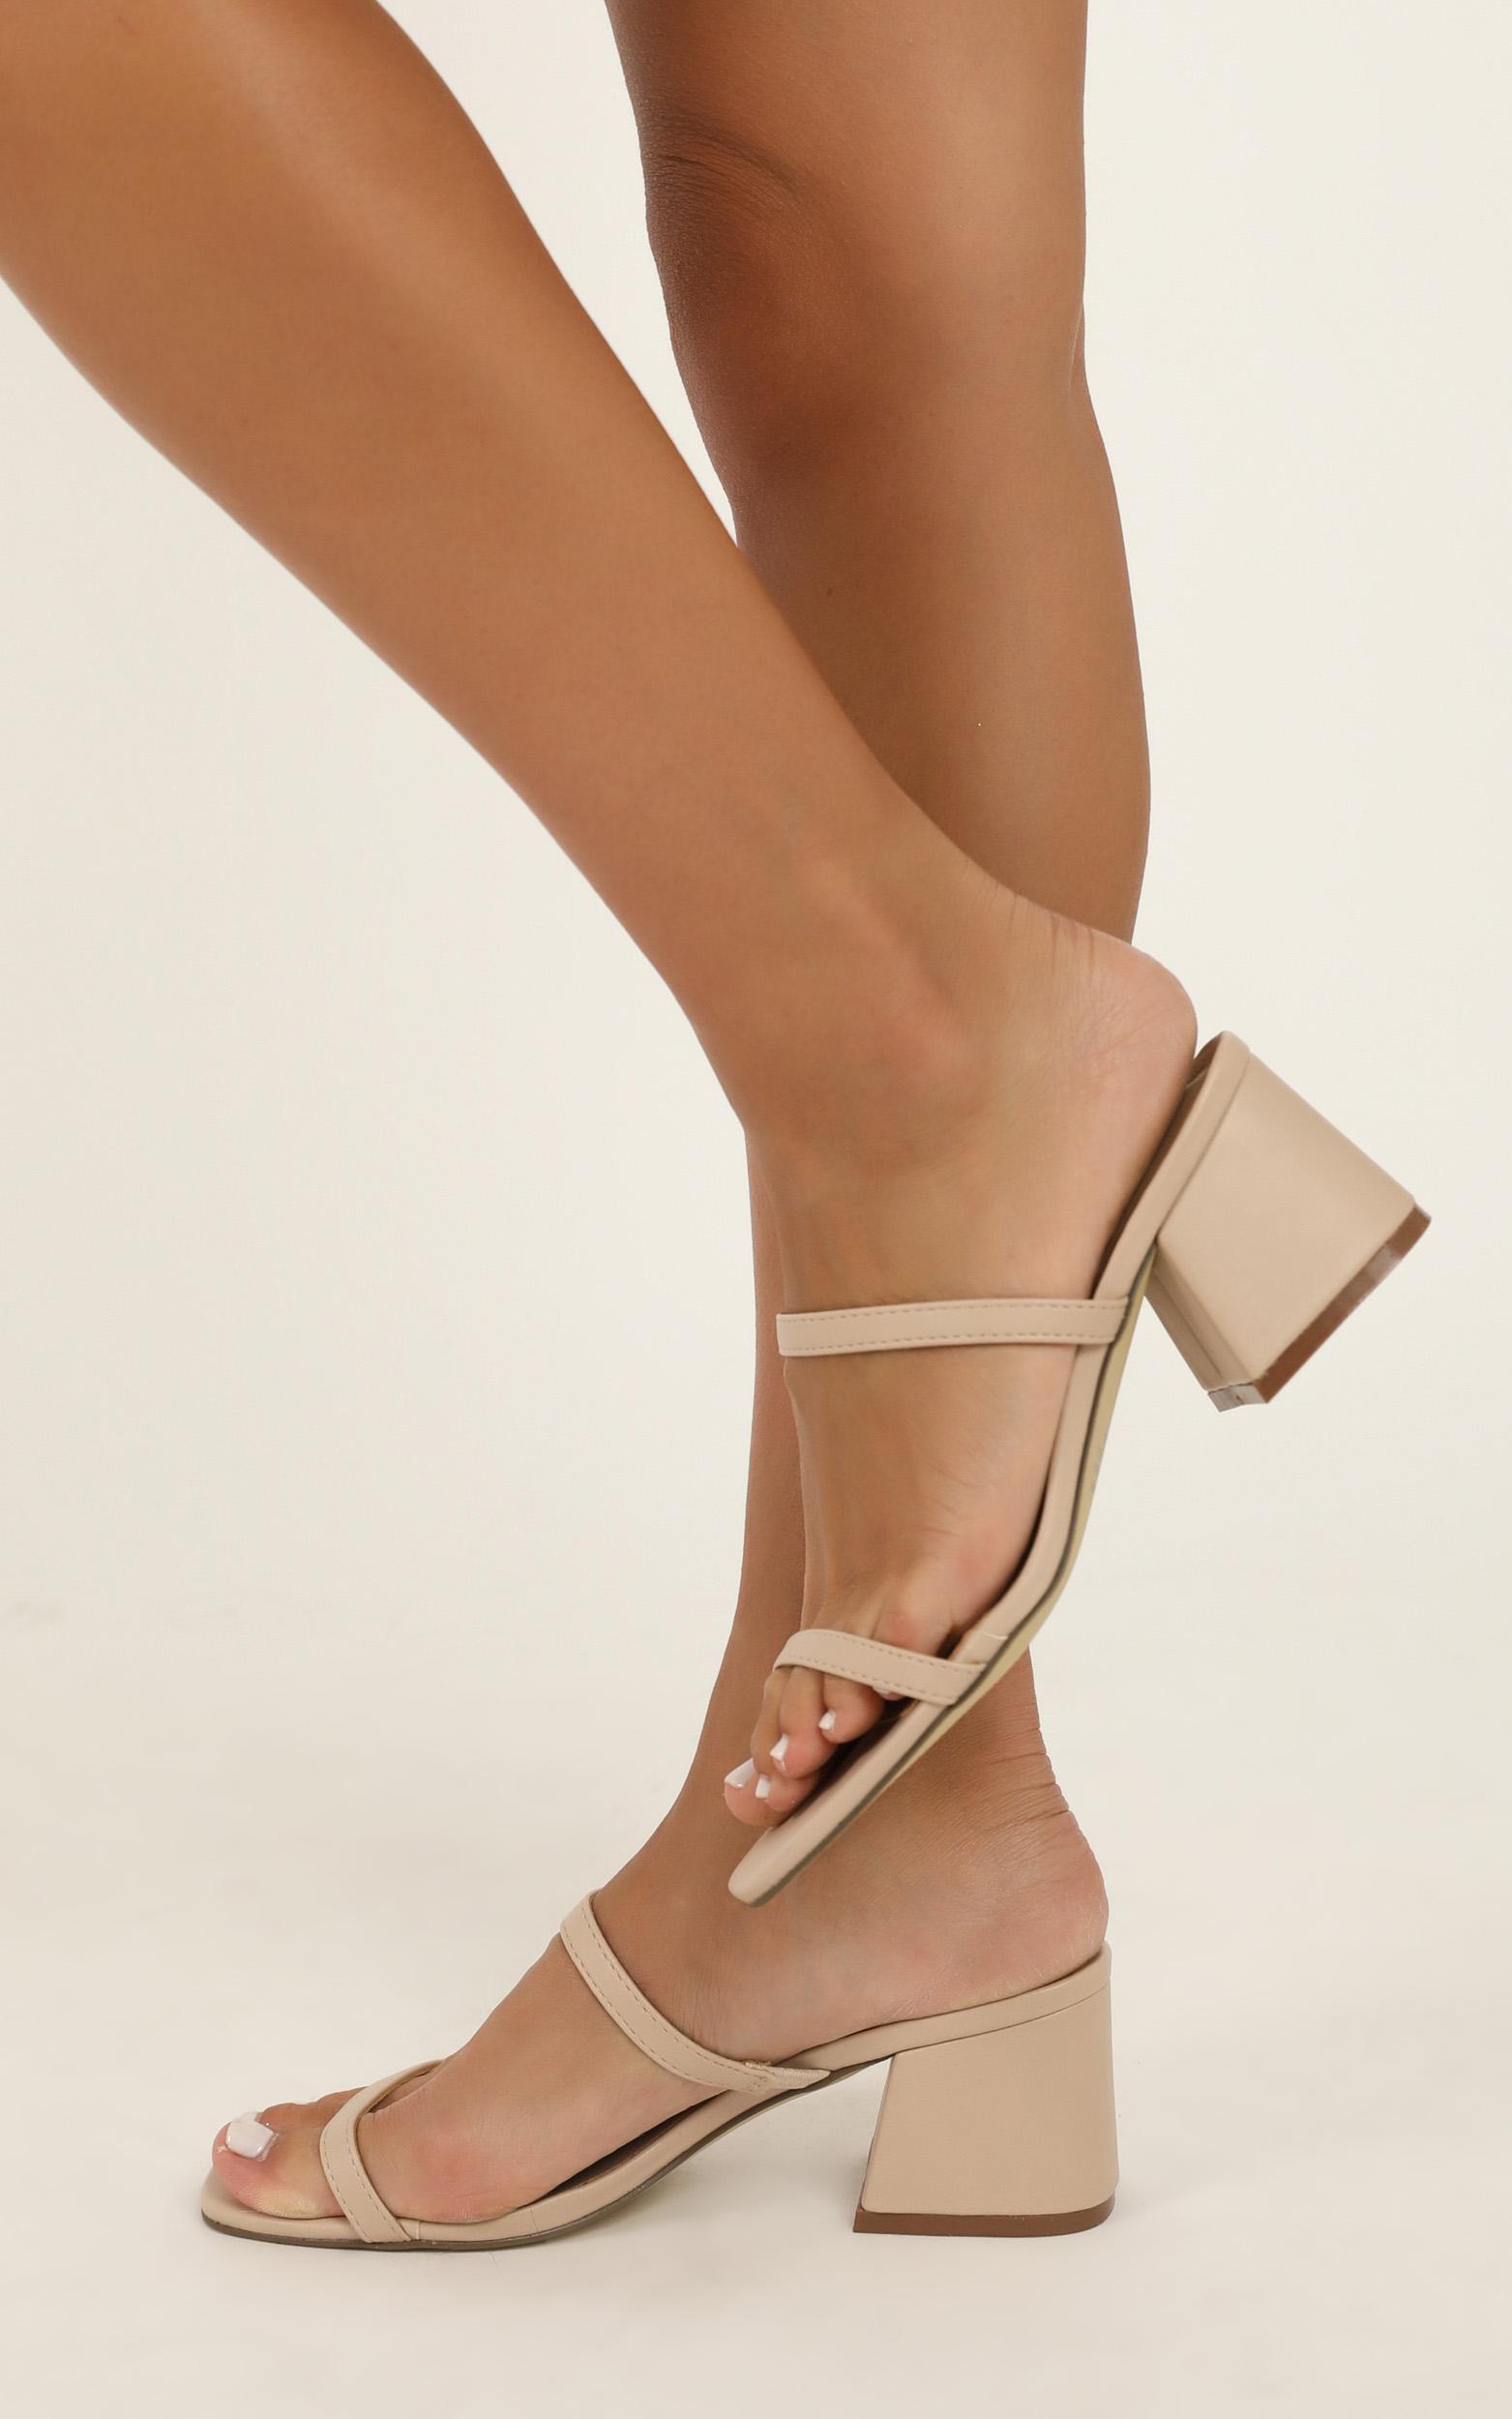 Therapy - Goldie Heels in nude - 10, Beige, hi-res image number null